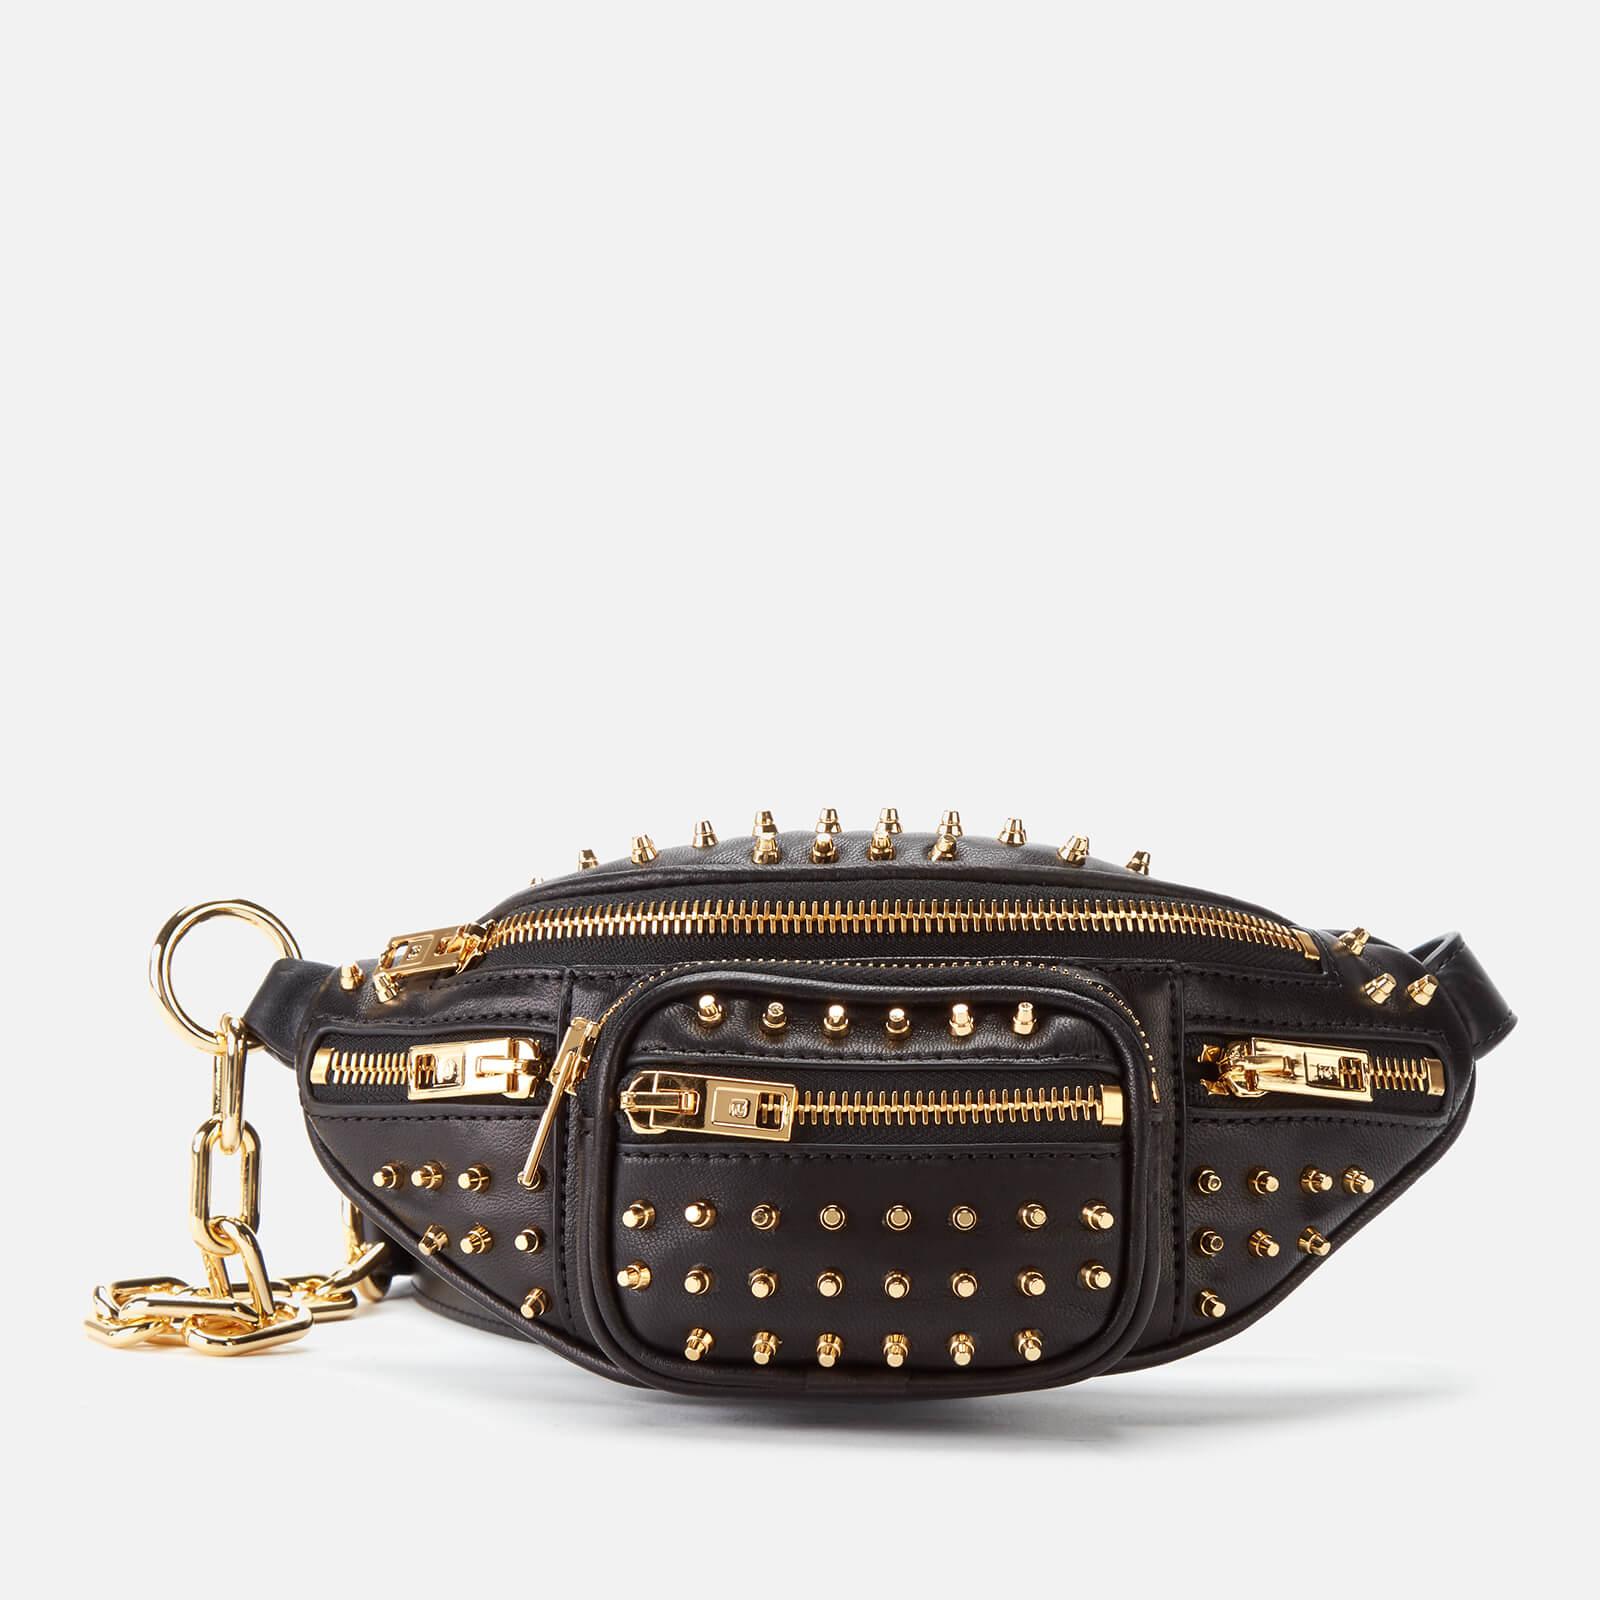 345739cda4f Alexander Wang Women's Attica Soft Mini Stud Belt Bag - Black